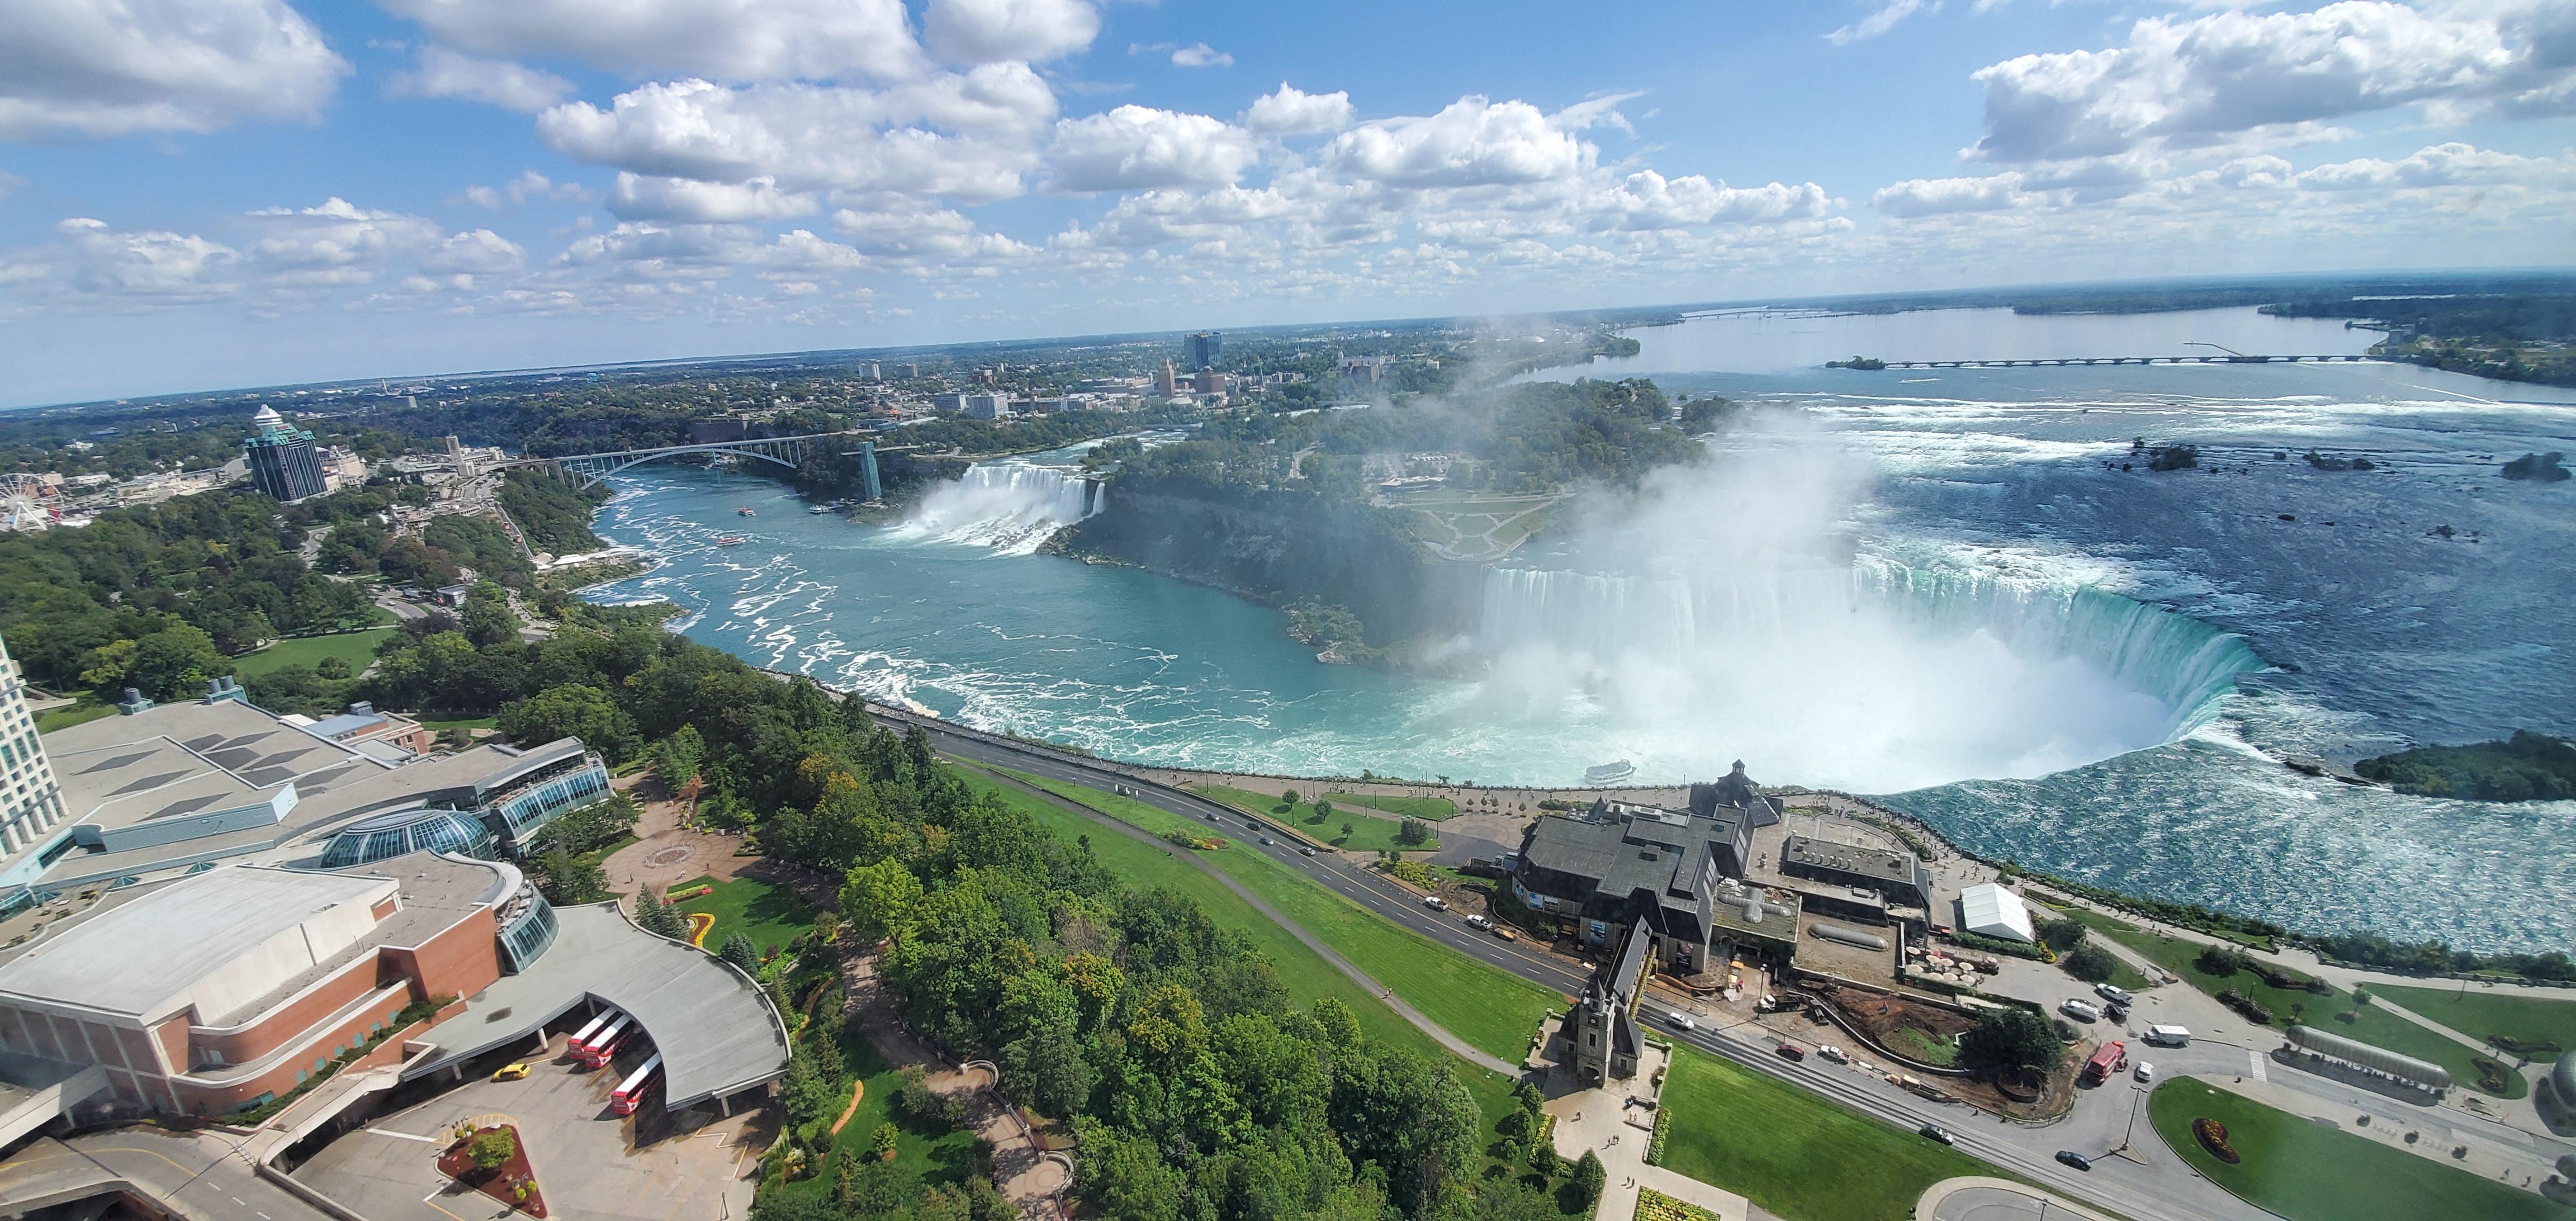 Niagara 4k Wallpapers For Your Desktop Or Mobile Screen Free